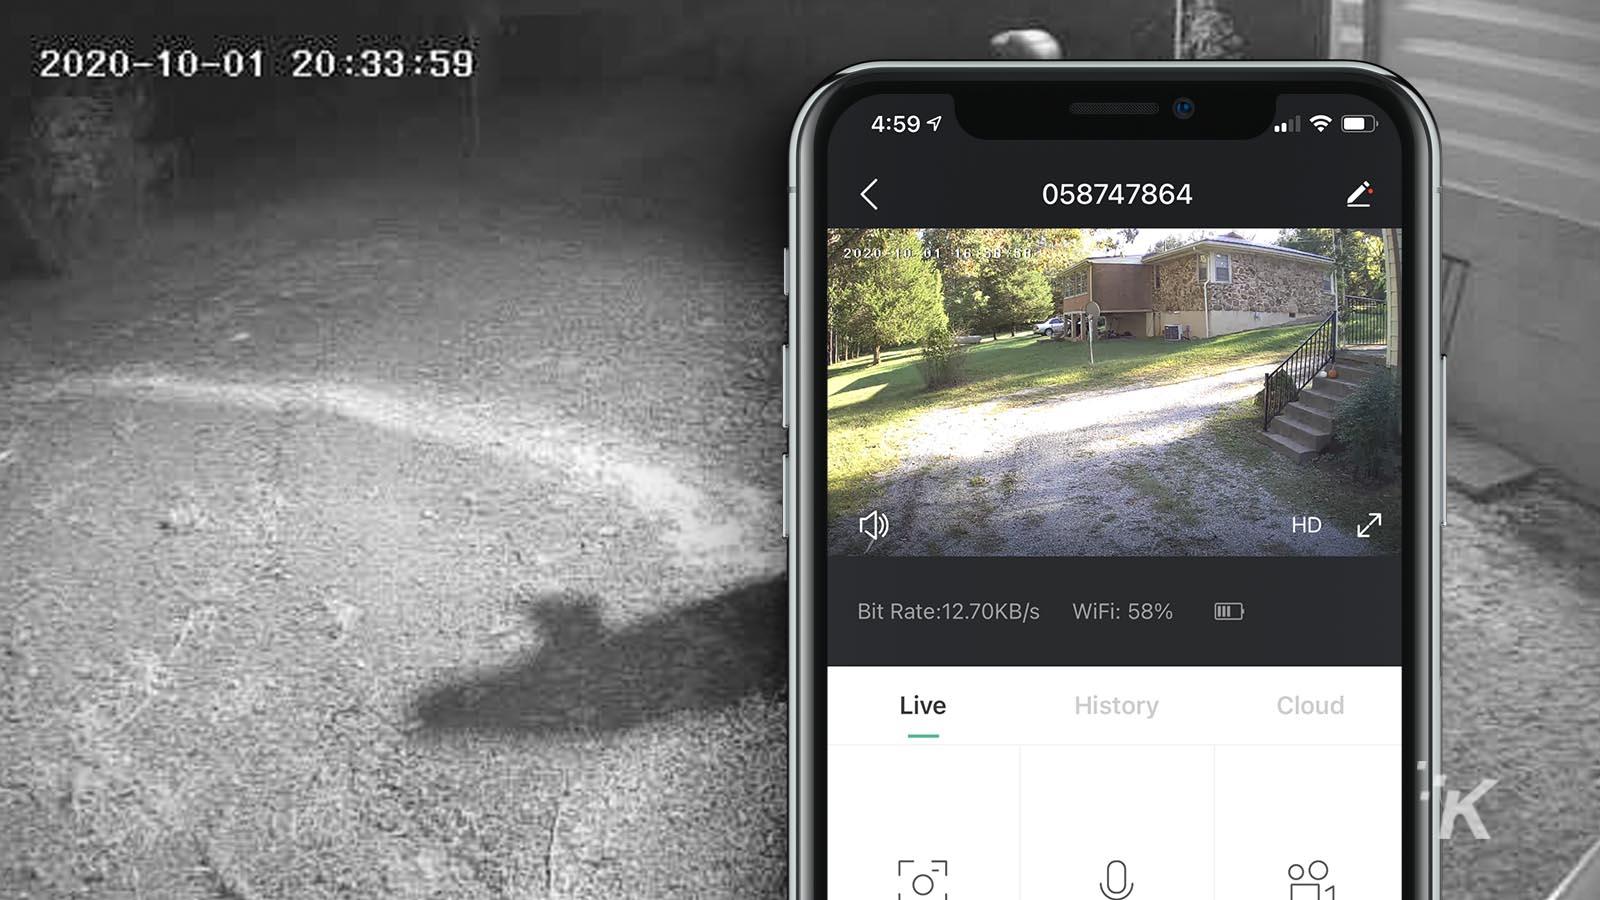 meco security camera app